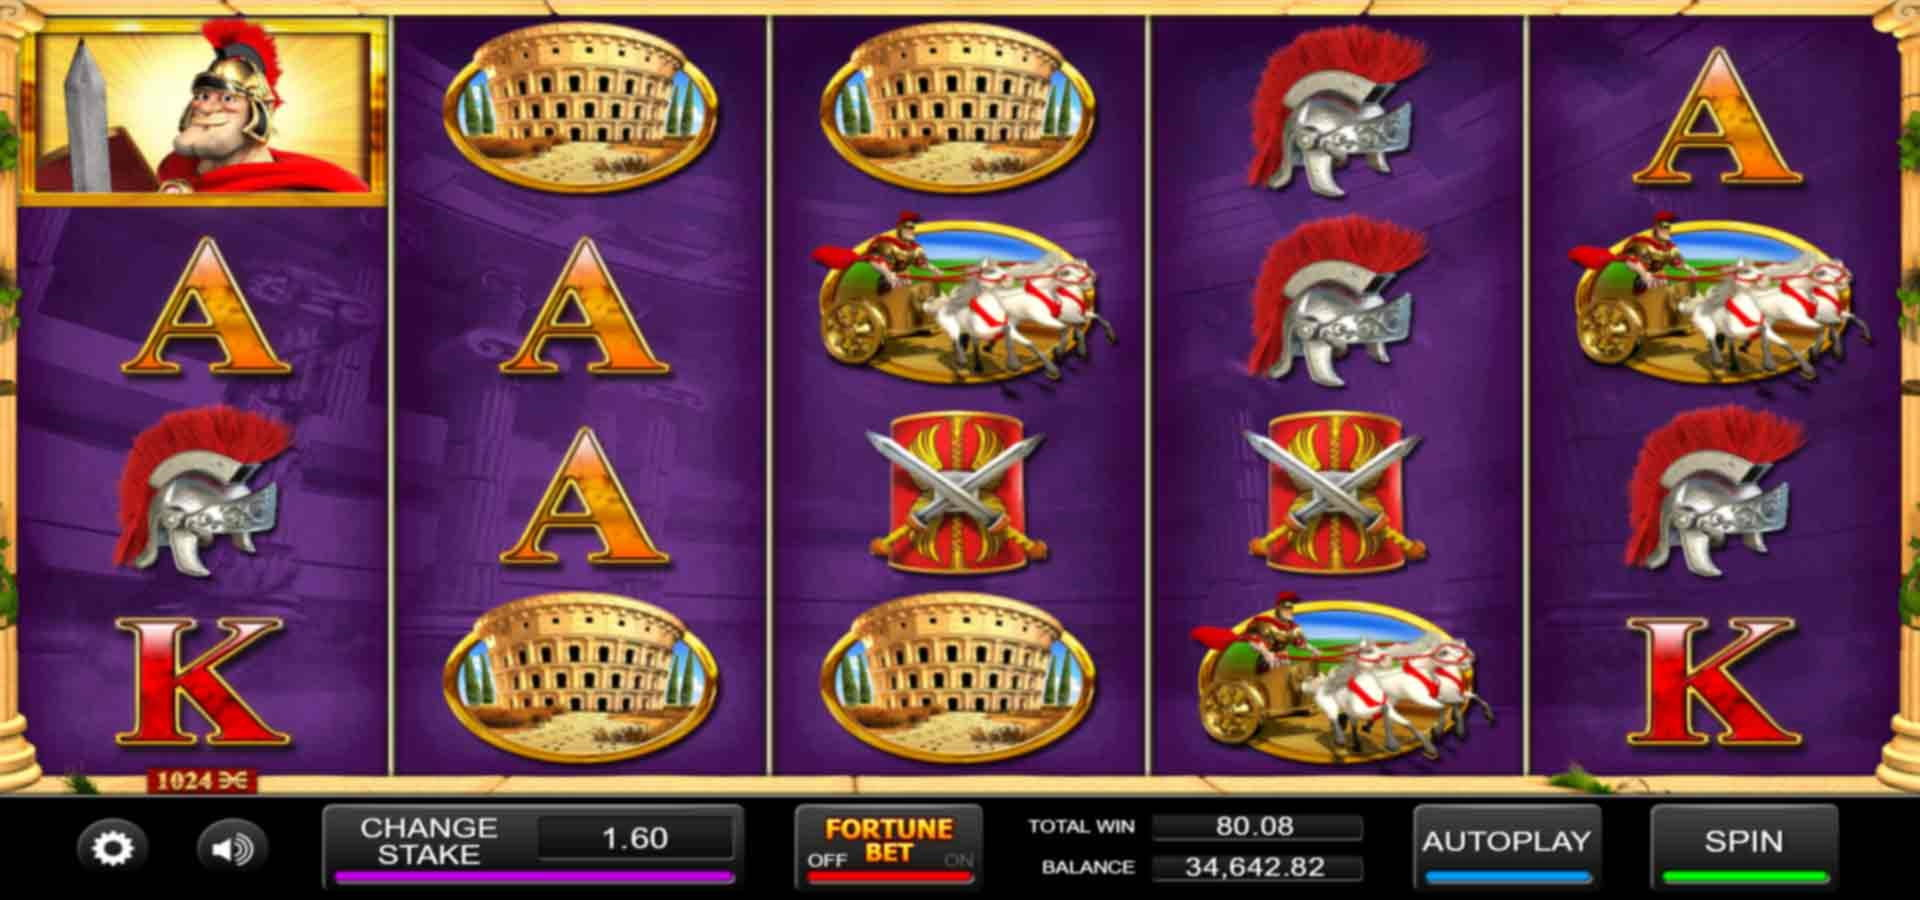 Eur 335 Casino Tournament at Rizk